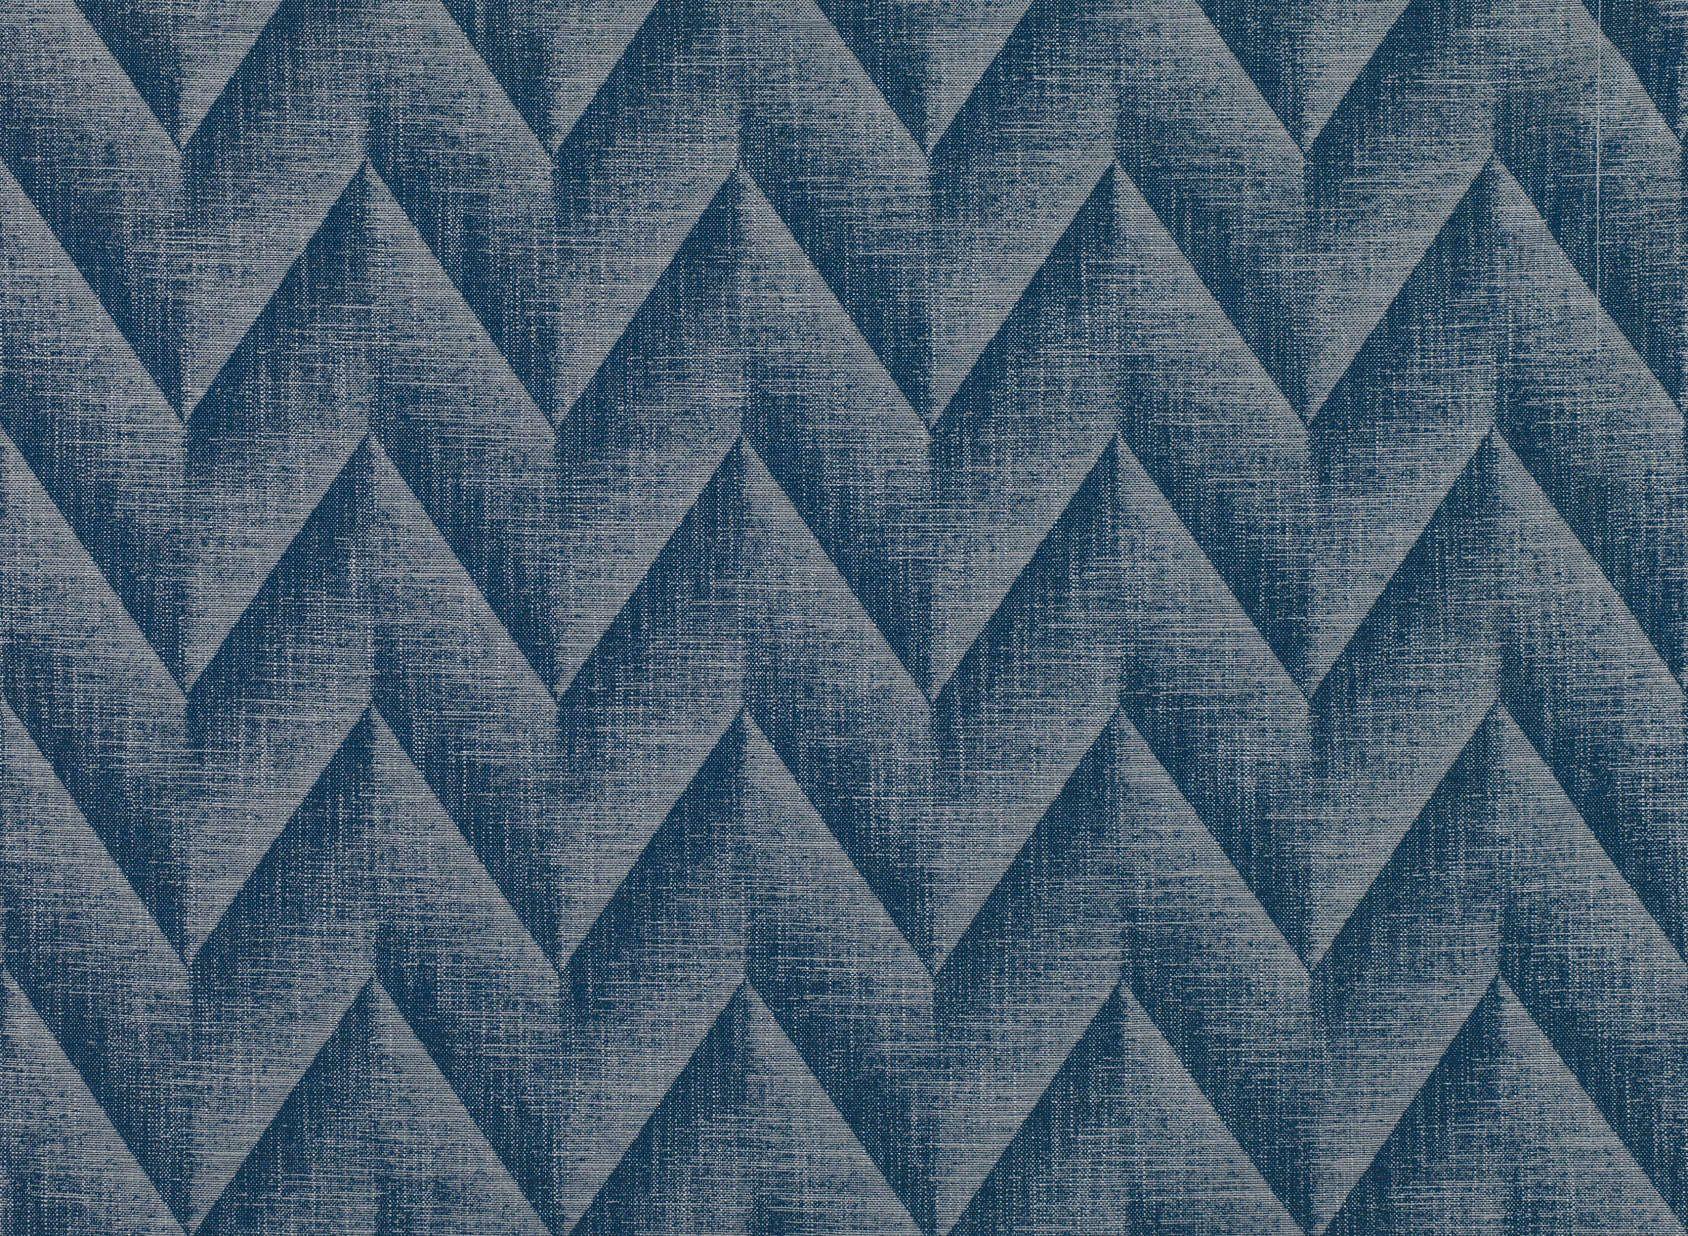 Apex Nightshadow Fade Contemporary Textured Weaves Kirkby